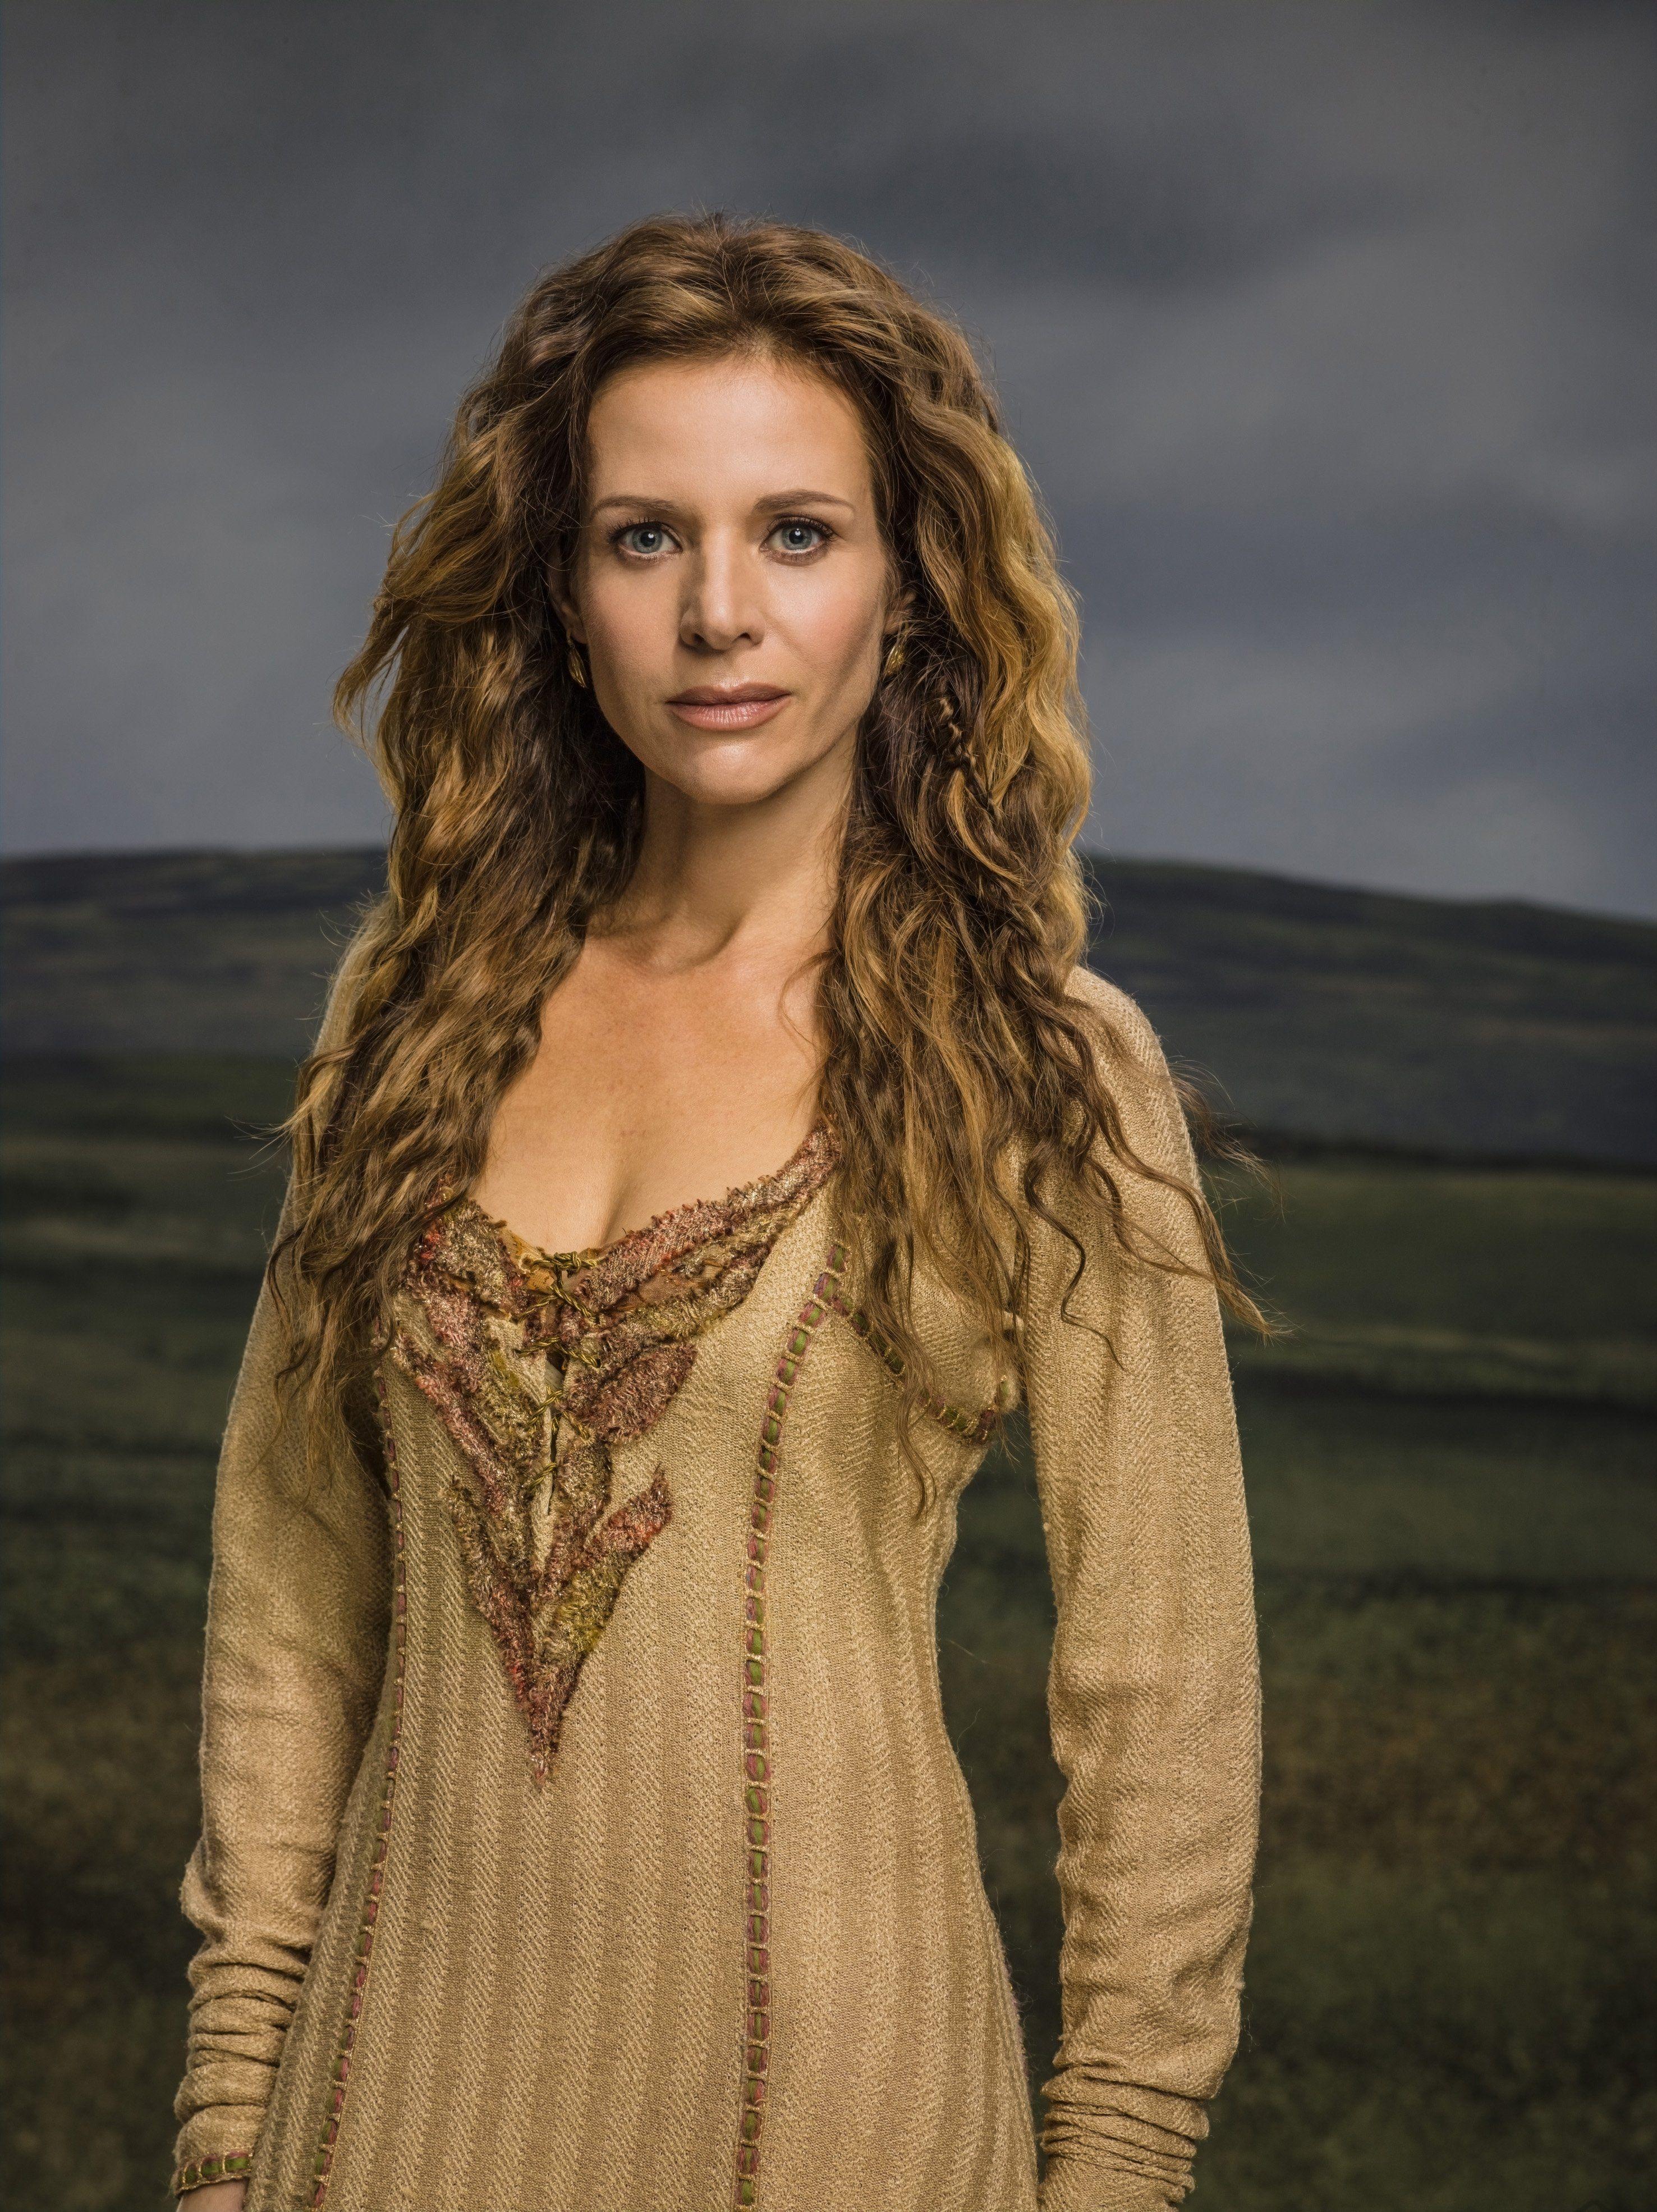 вам картинки актрис викингов какие объективы